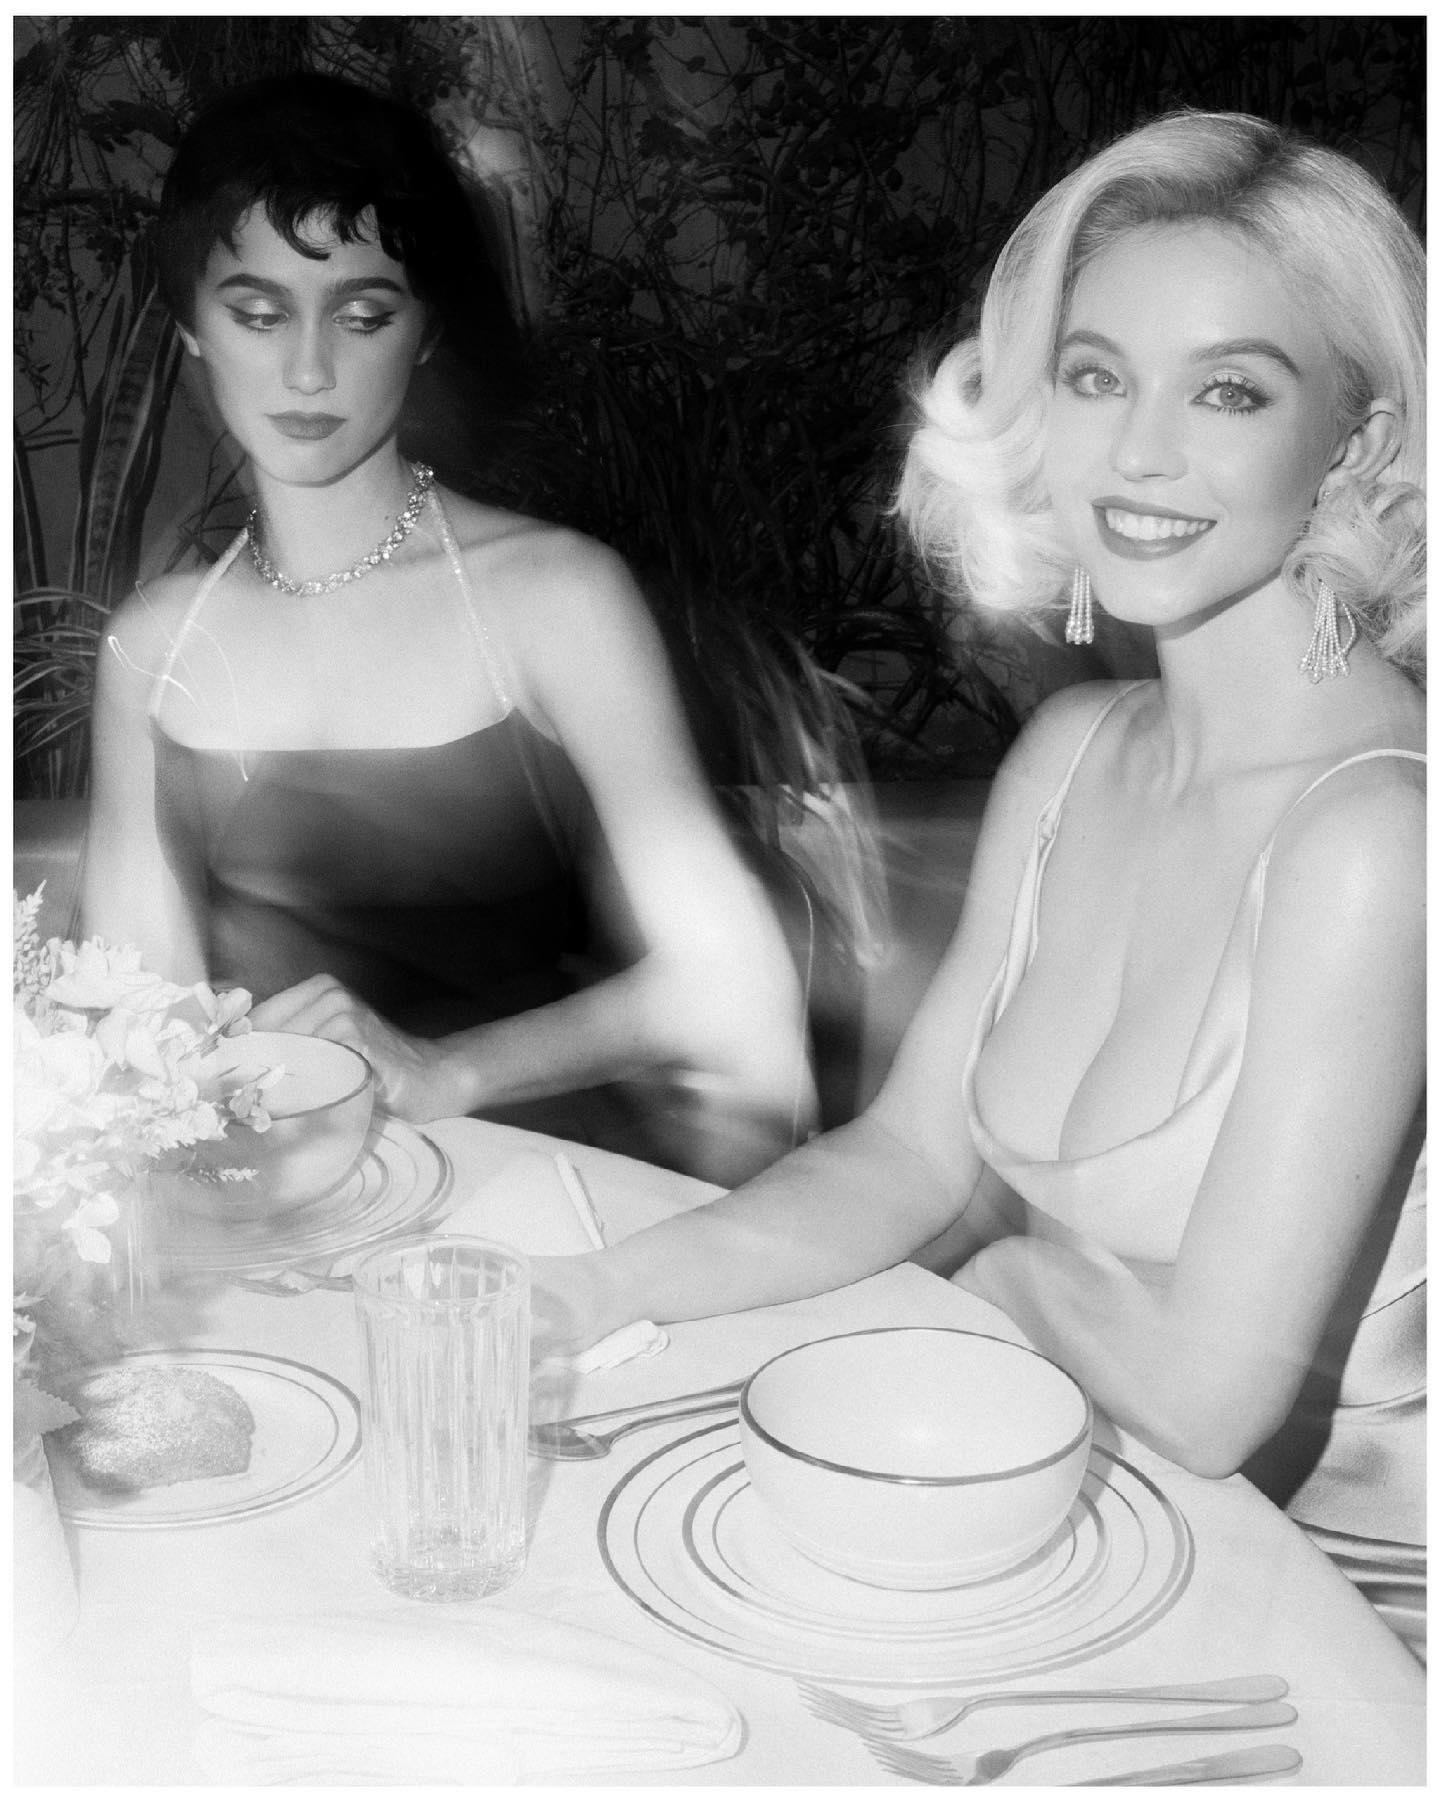 Sydney Sweeney and Maude Apatow Remake An Iconic Photo!.jpg